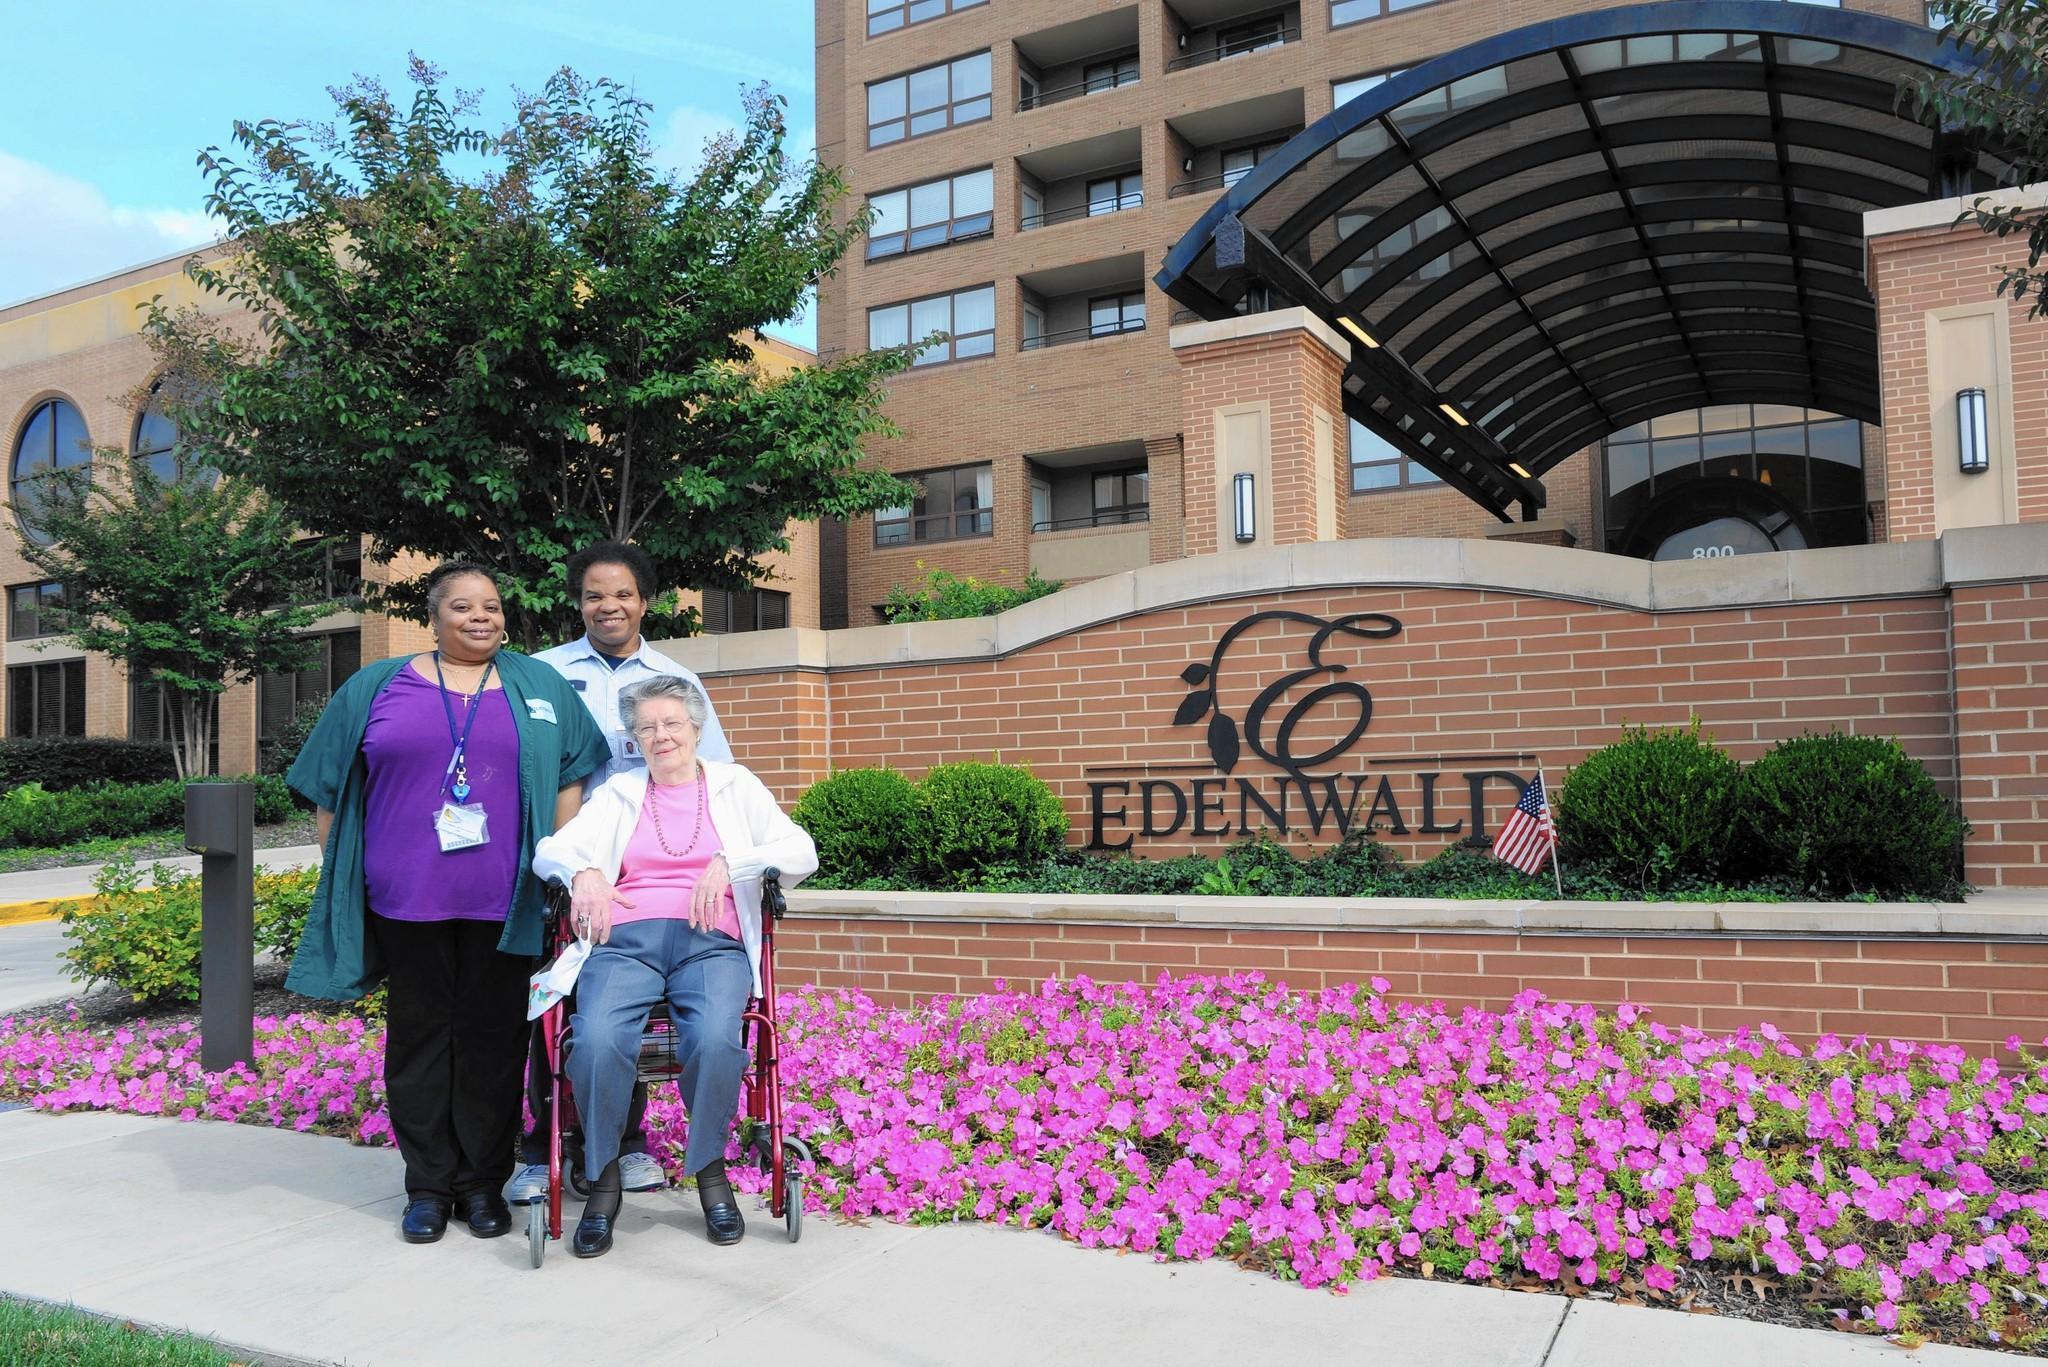 Edenwald Retirement Community Celebrates 30 Years In